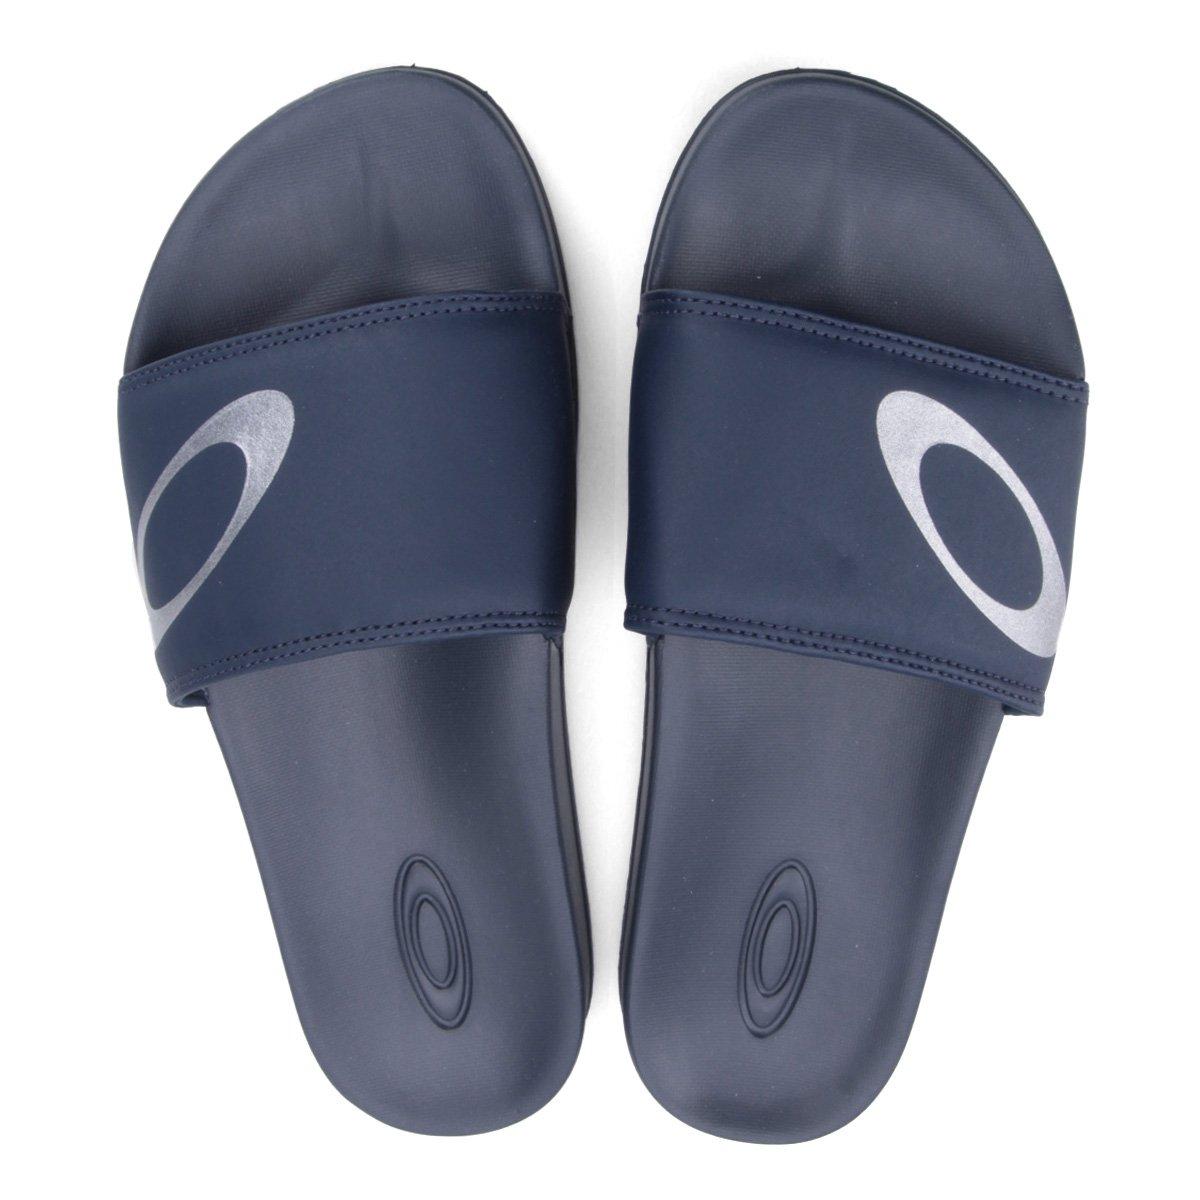 e72ed6d05737 Chinelo Oakley Malibu Slide Masculino - Marinho - Compre Agora ...